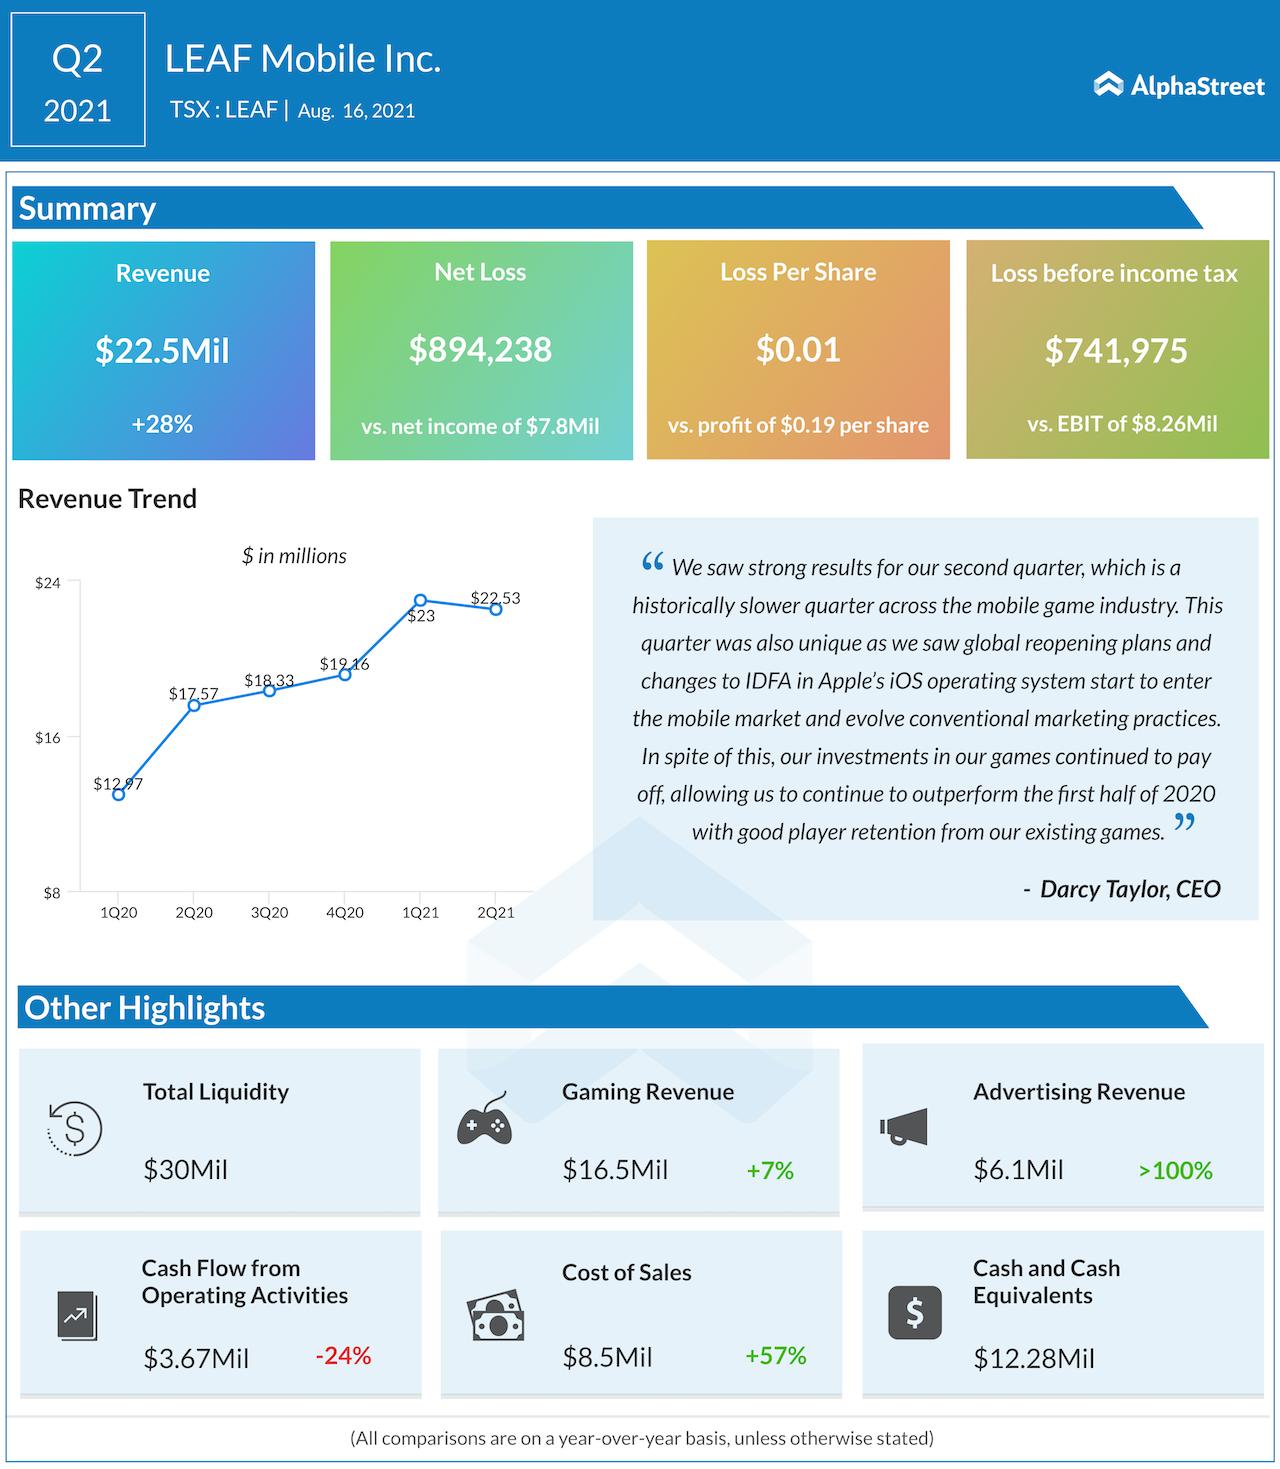 LEAF Mobile Q2 2021 earnings